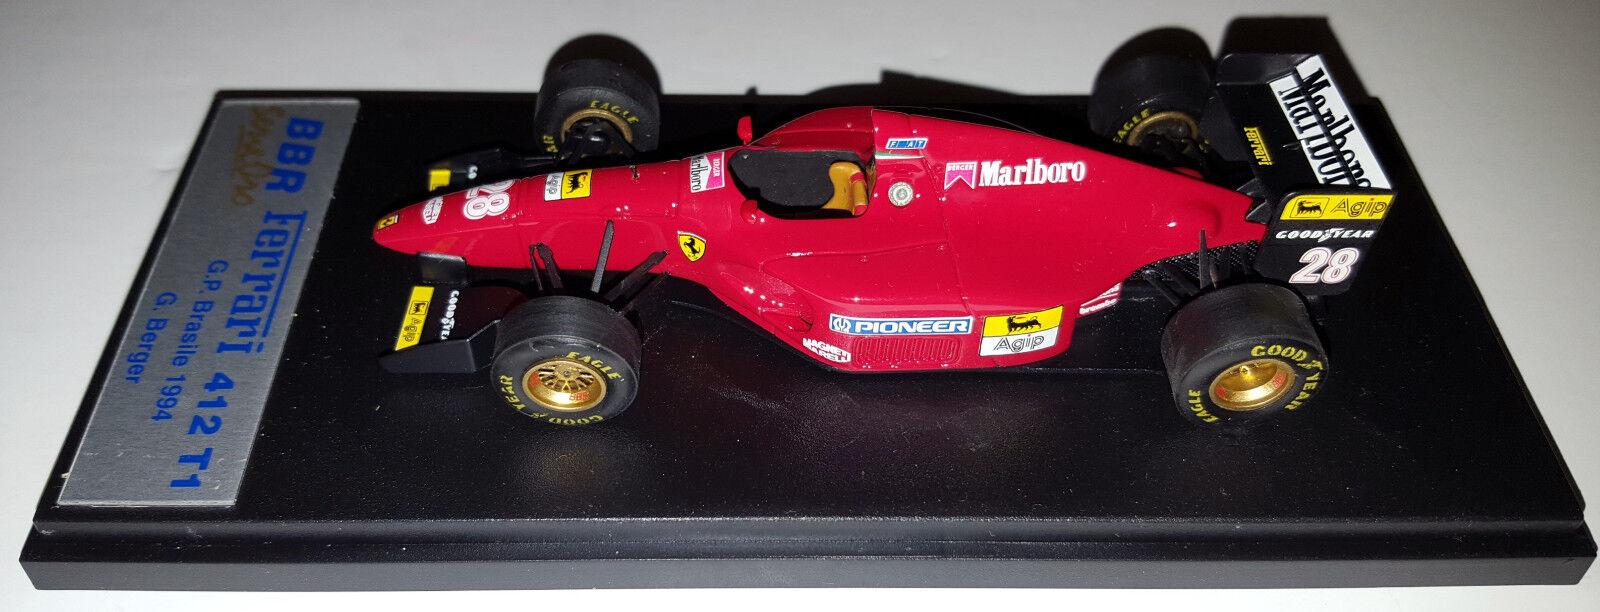 BBR SERIE or BG26 1 43 Ferrari 412 T1  28 1994 Brésil grand prix de Gerhard Berger